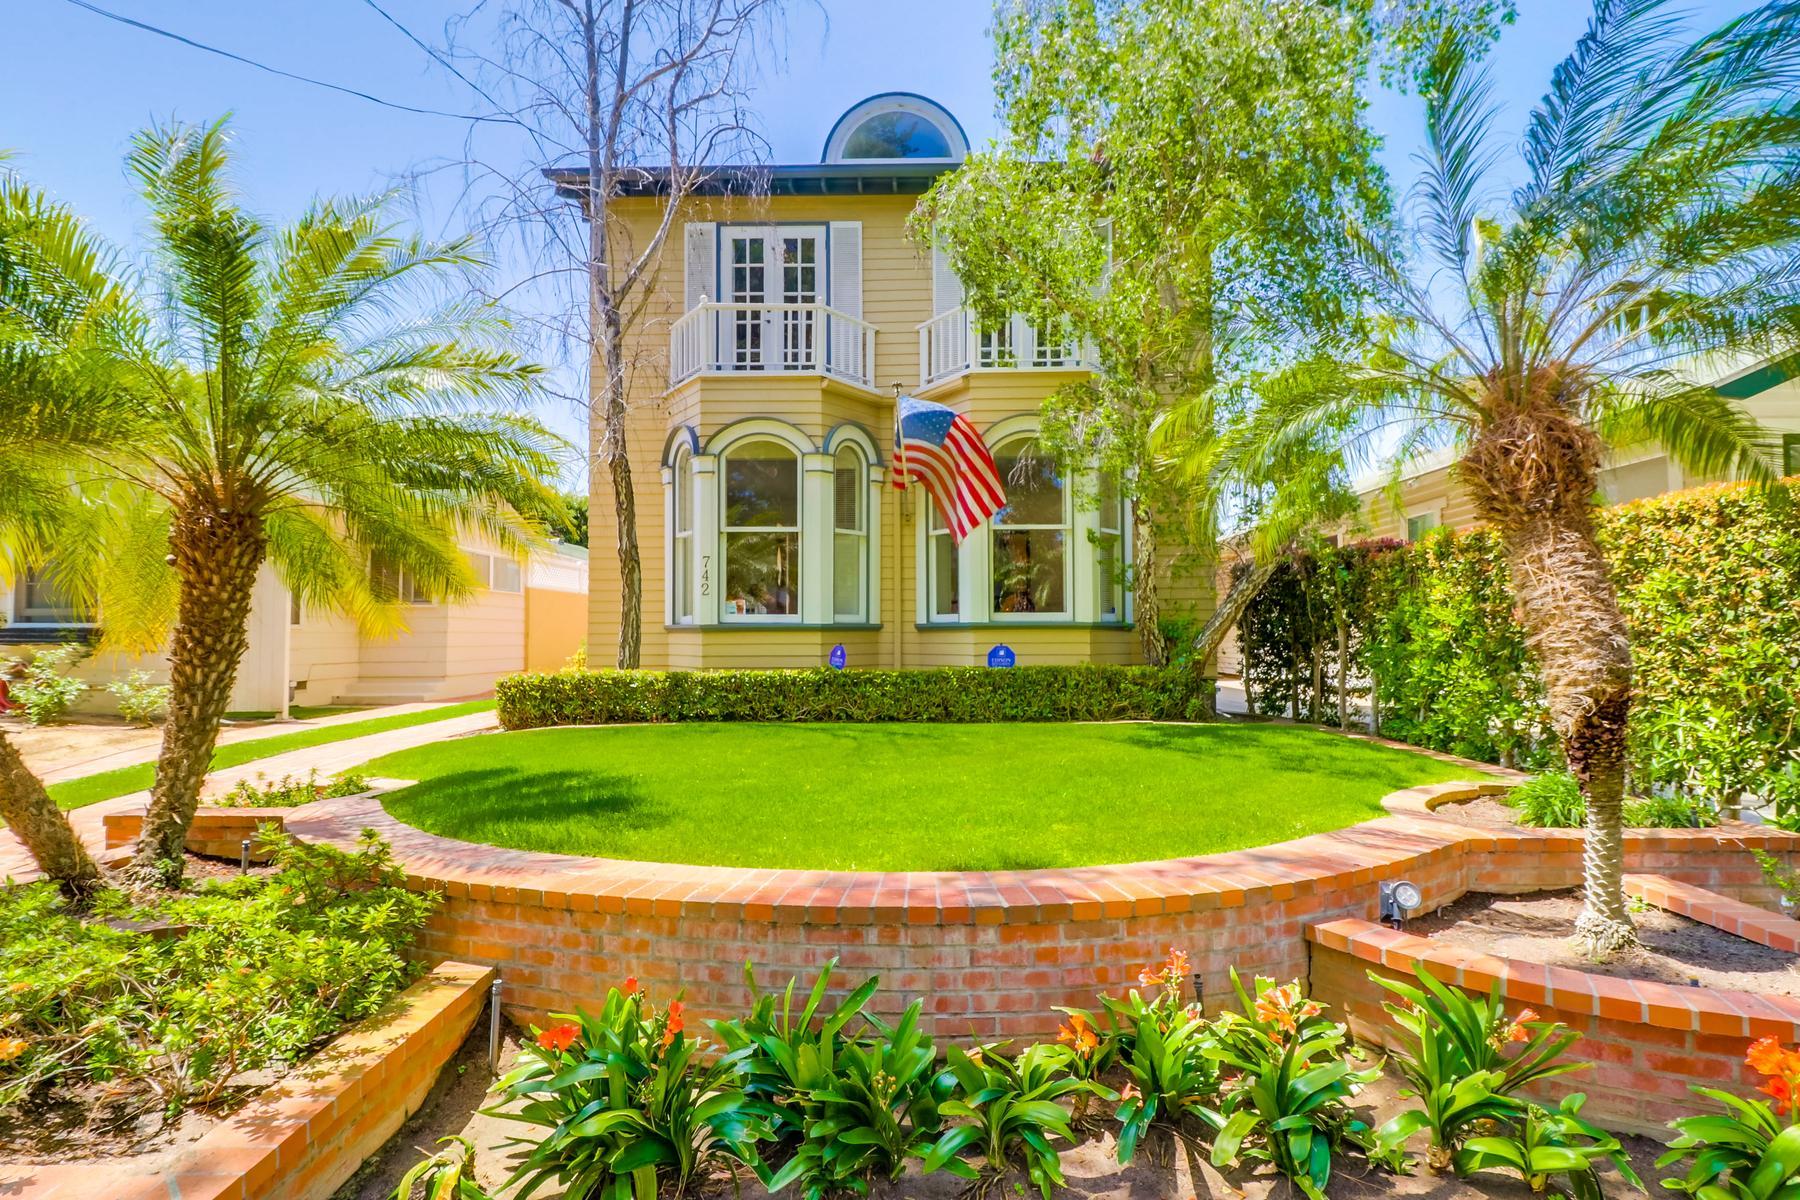 Single Family Homes for Sale at 742 Margarita Avenue Coronado, California 92118 United States